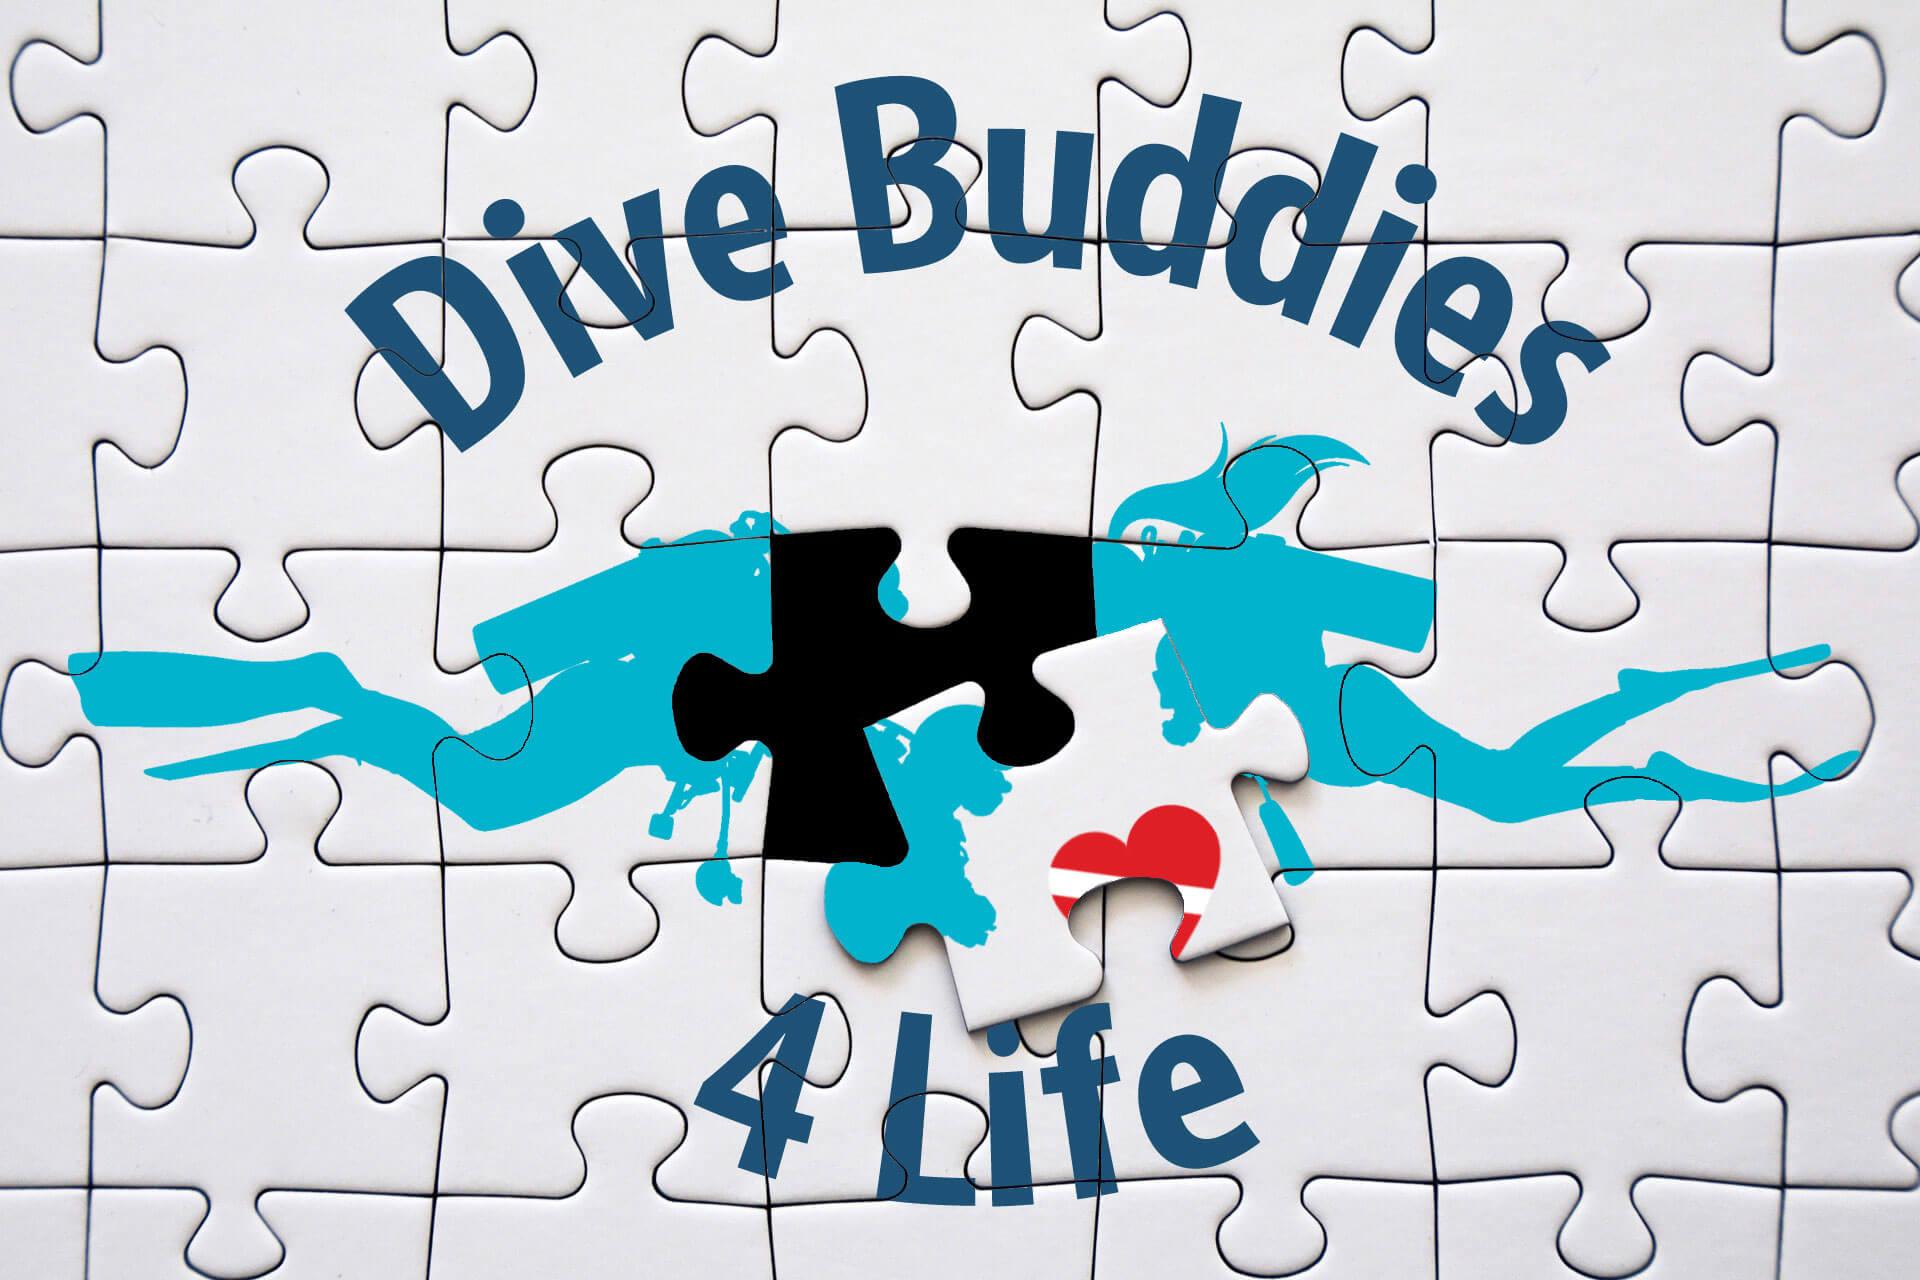 Dive Buddies For Life Puzzle Partnership